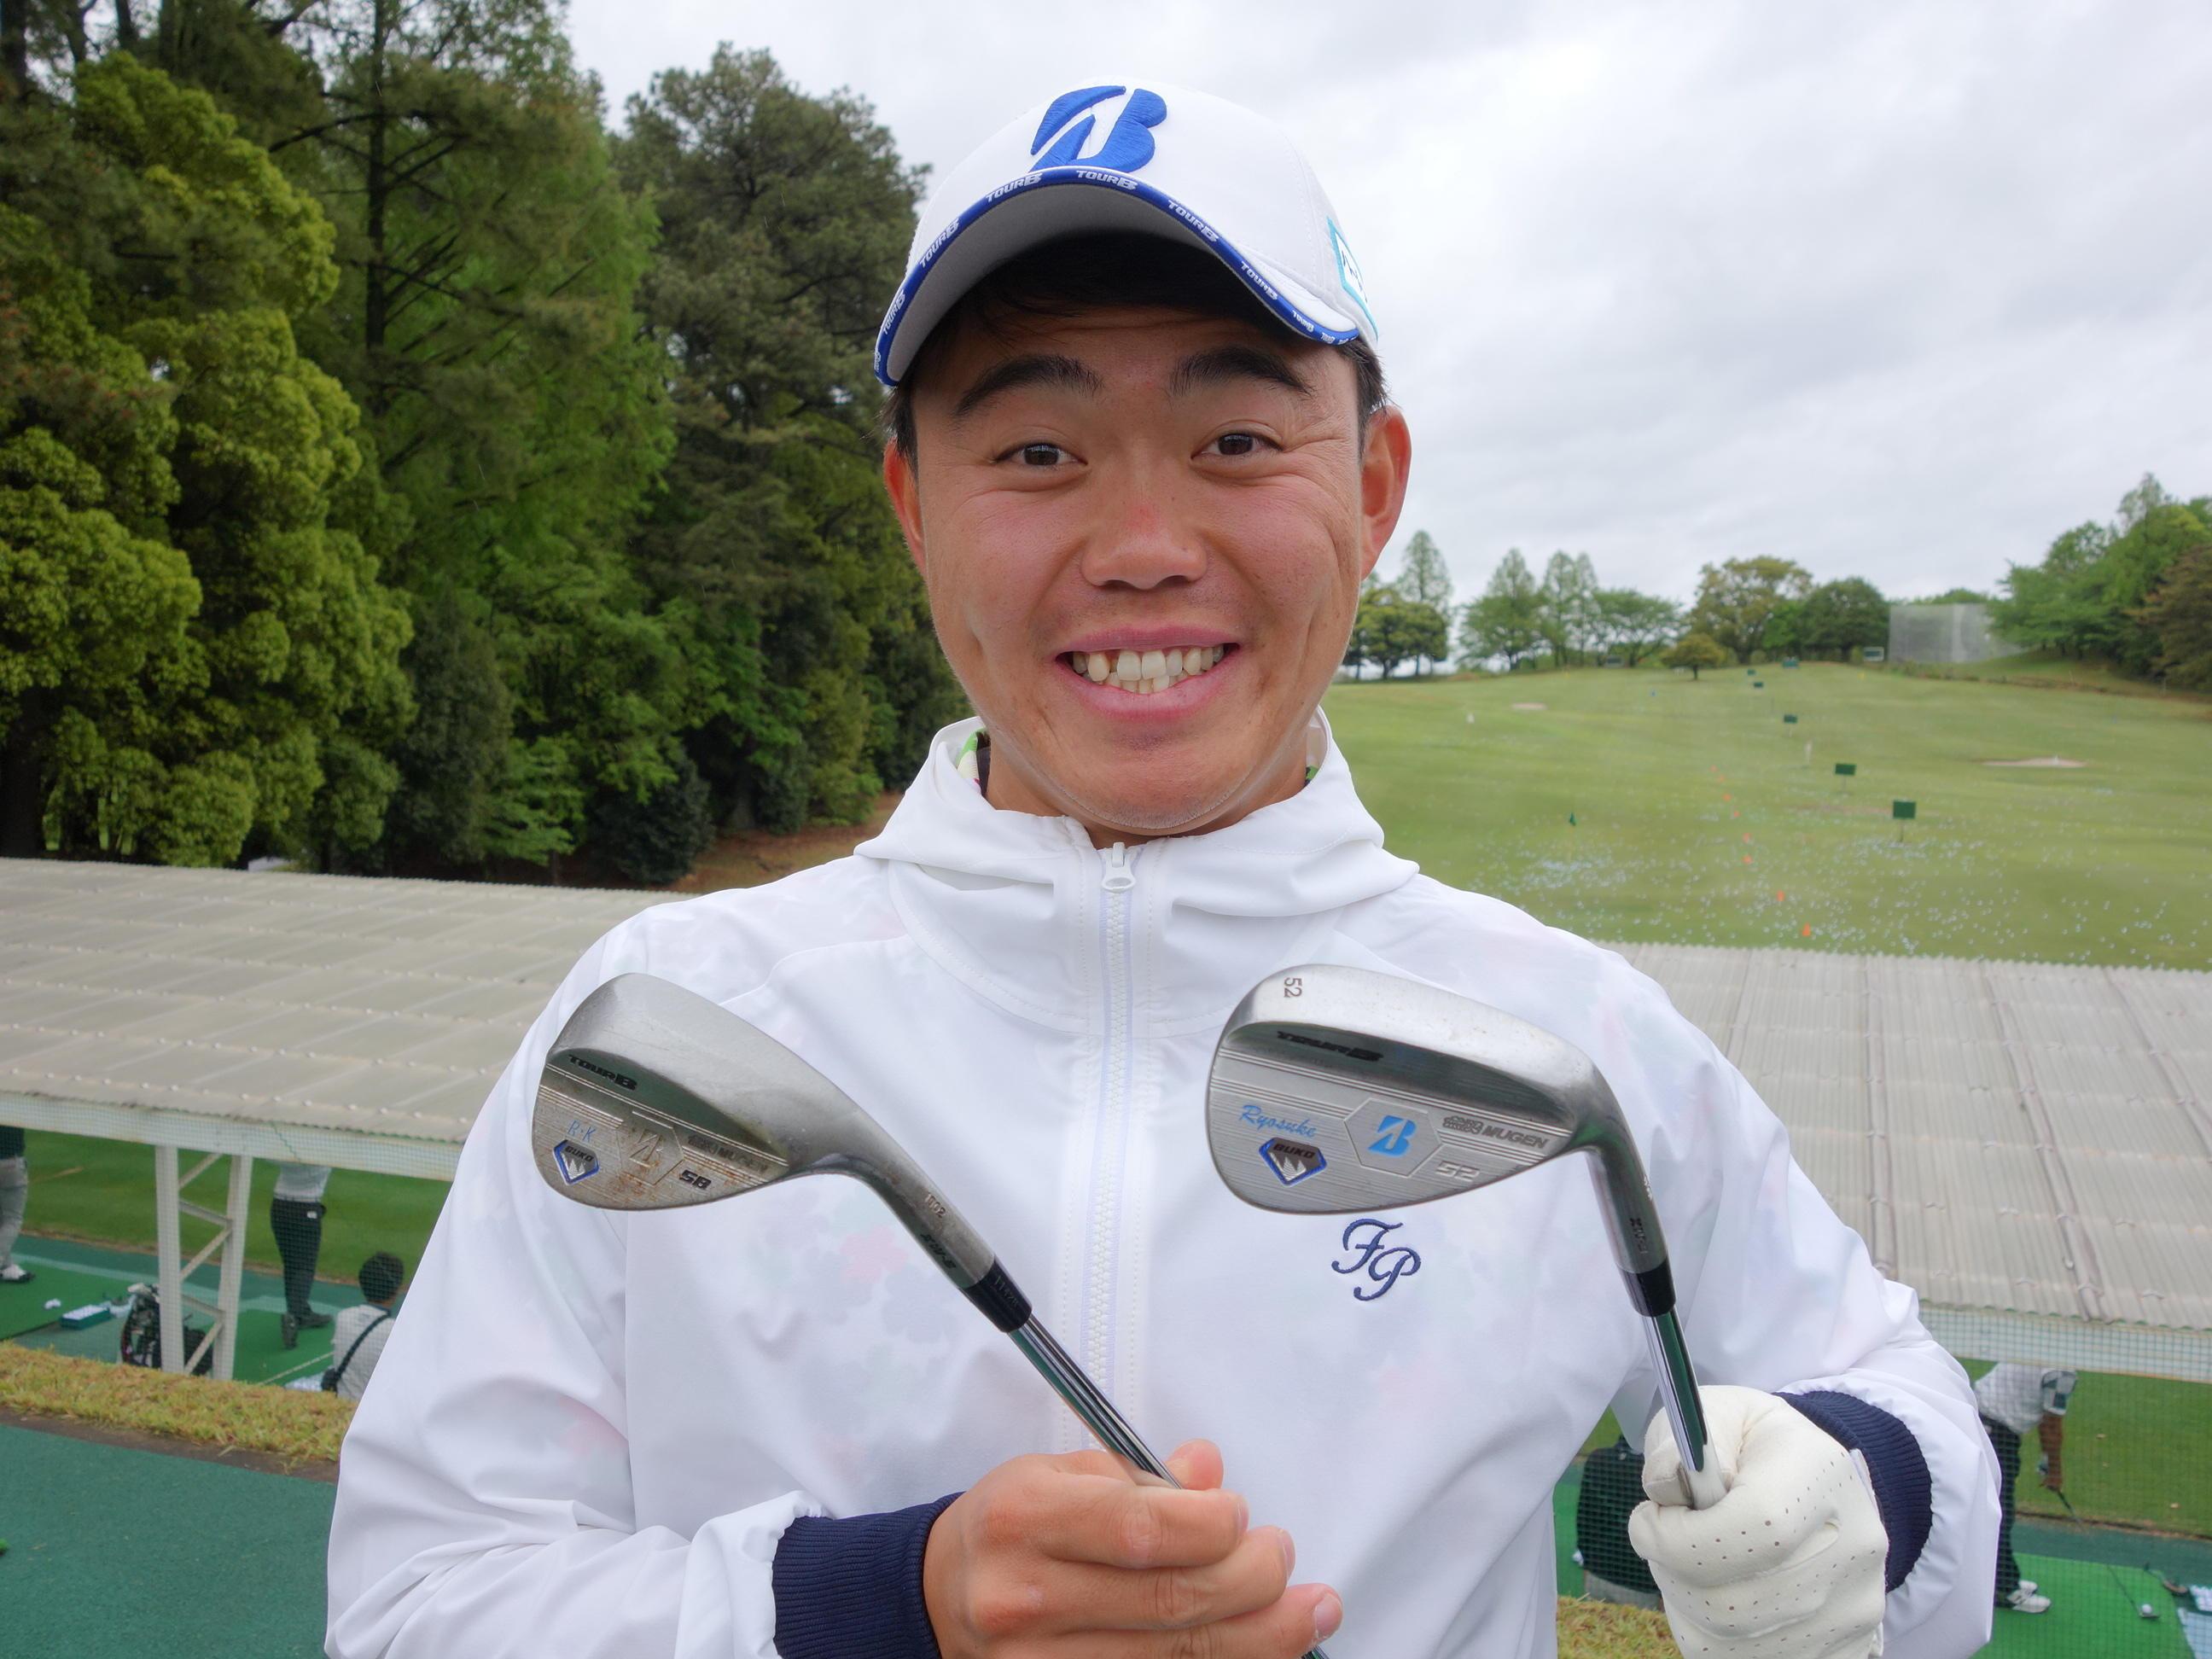 https://www.bs-golf.com/pro/63904141bf9153f50cc94390052de68f77717188.JPG